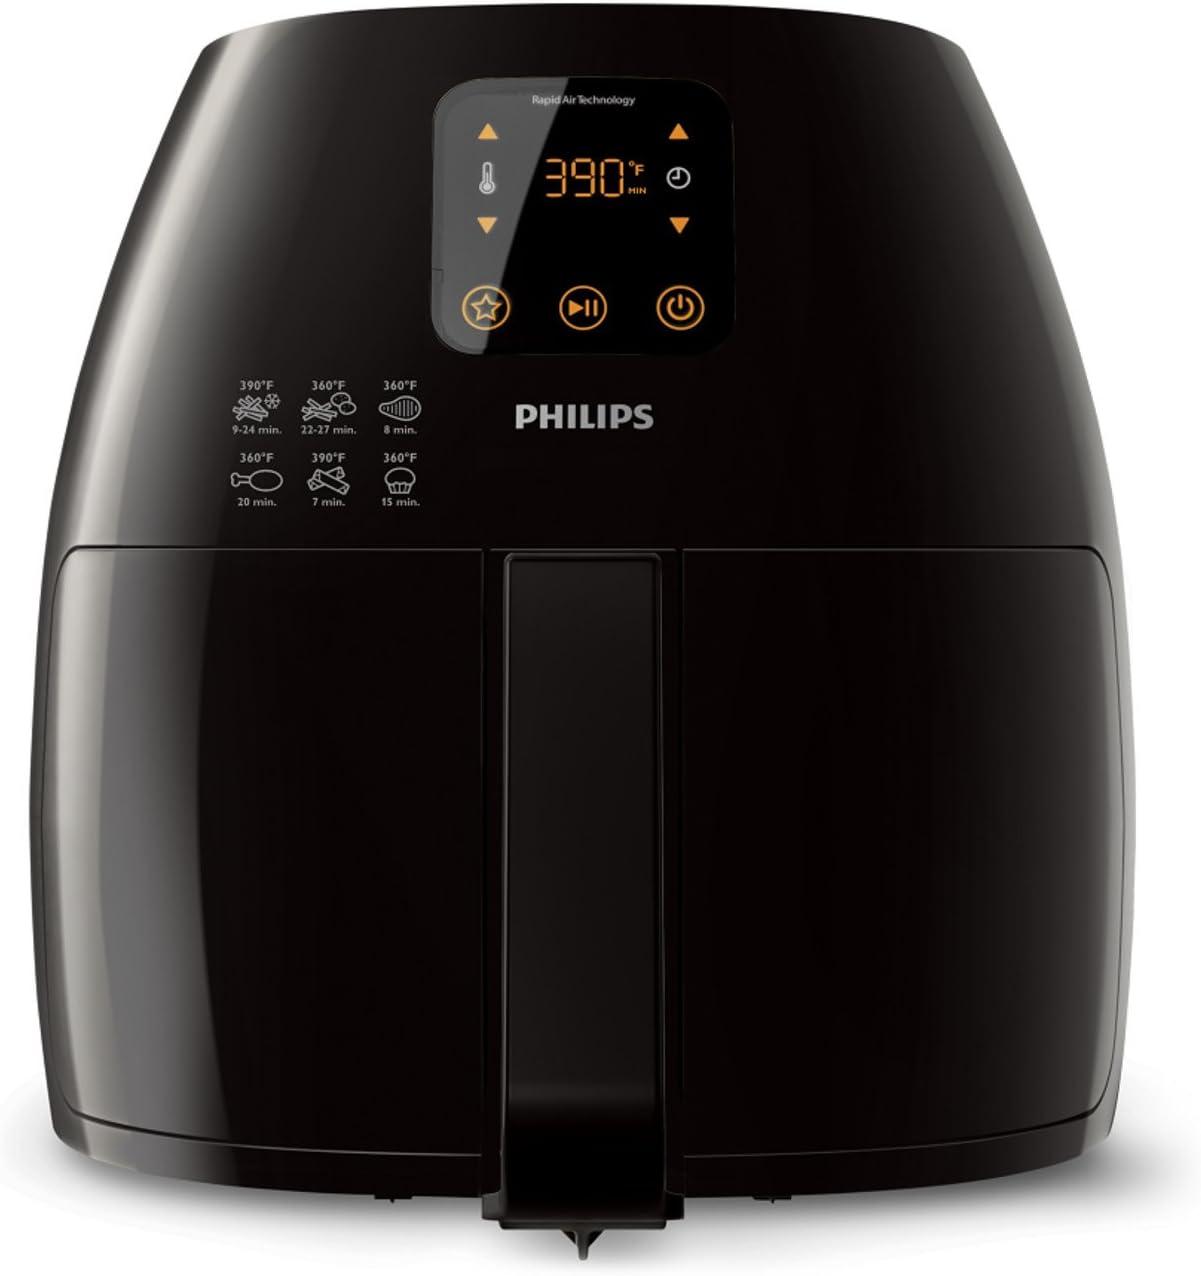 Philips Starfish Technology XL Airfryer, Digital Interface, Black - 2.65lb/3.5qt HD9240/94